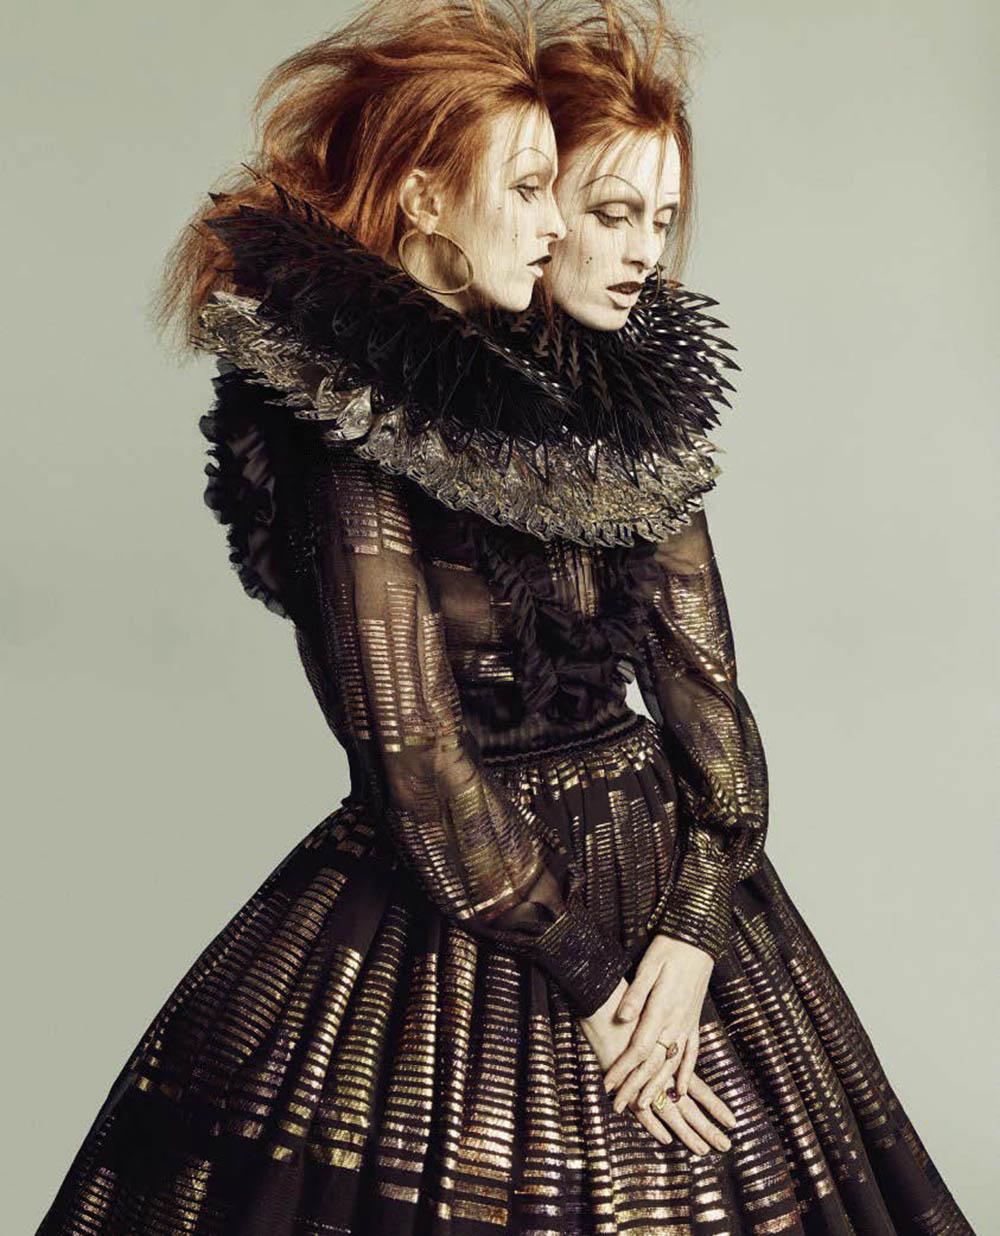 ''Una Canzone'' by Luigi & Iango for Vogue Italia October 2018